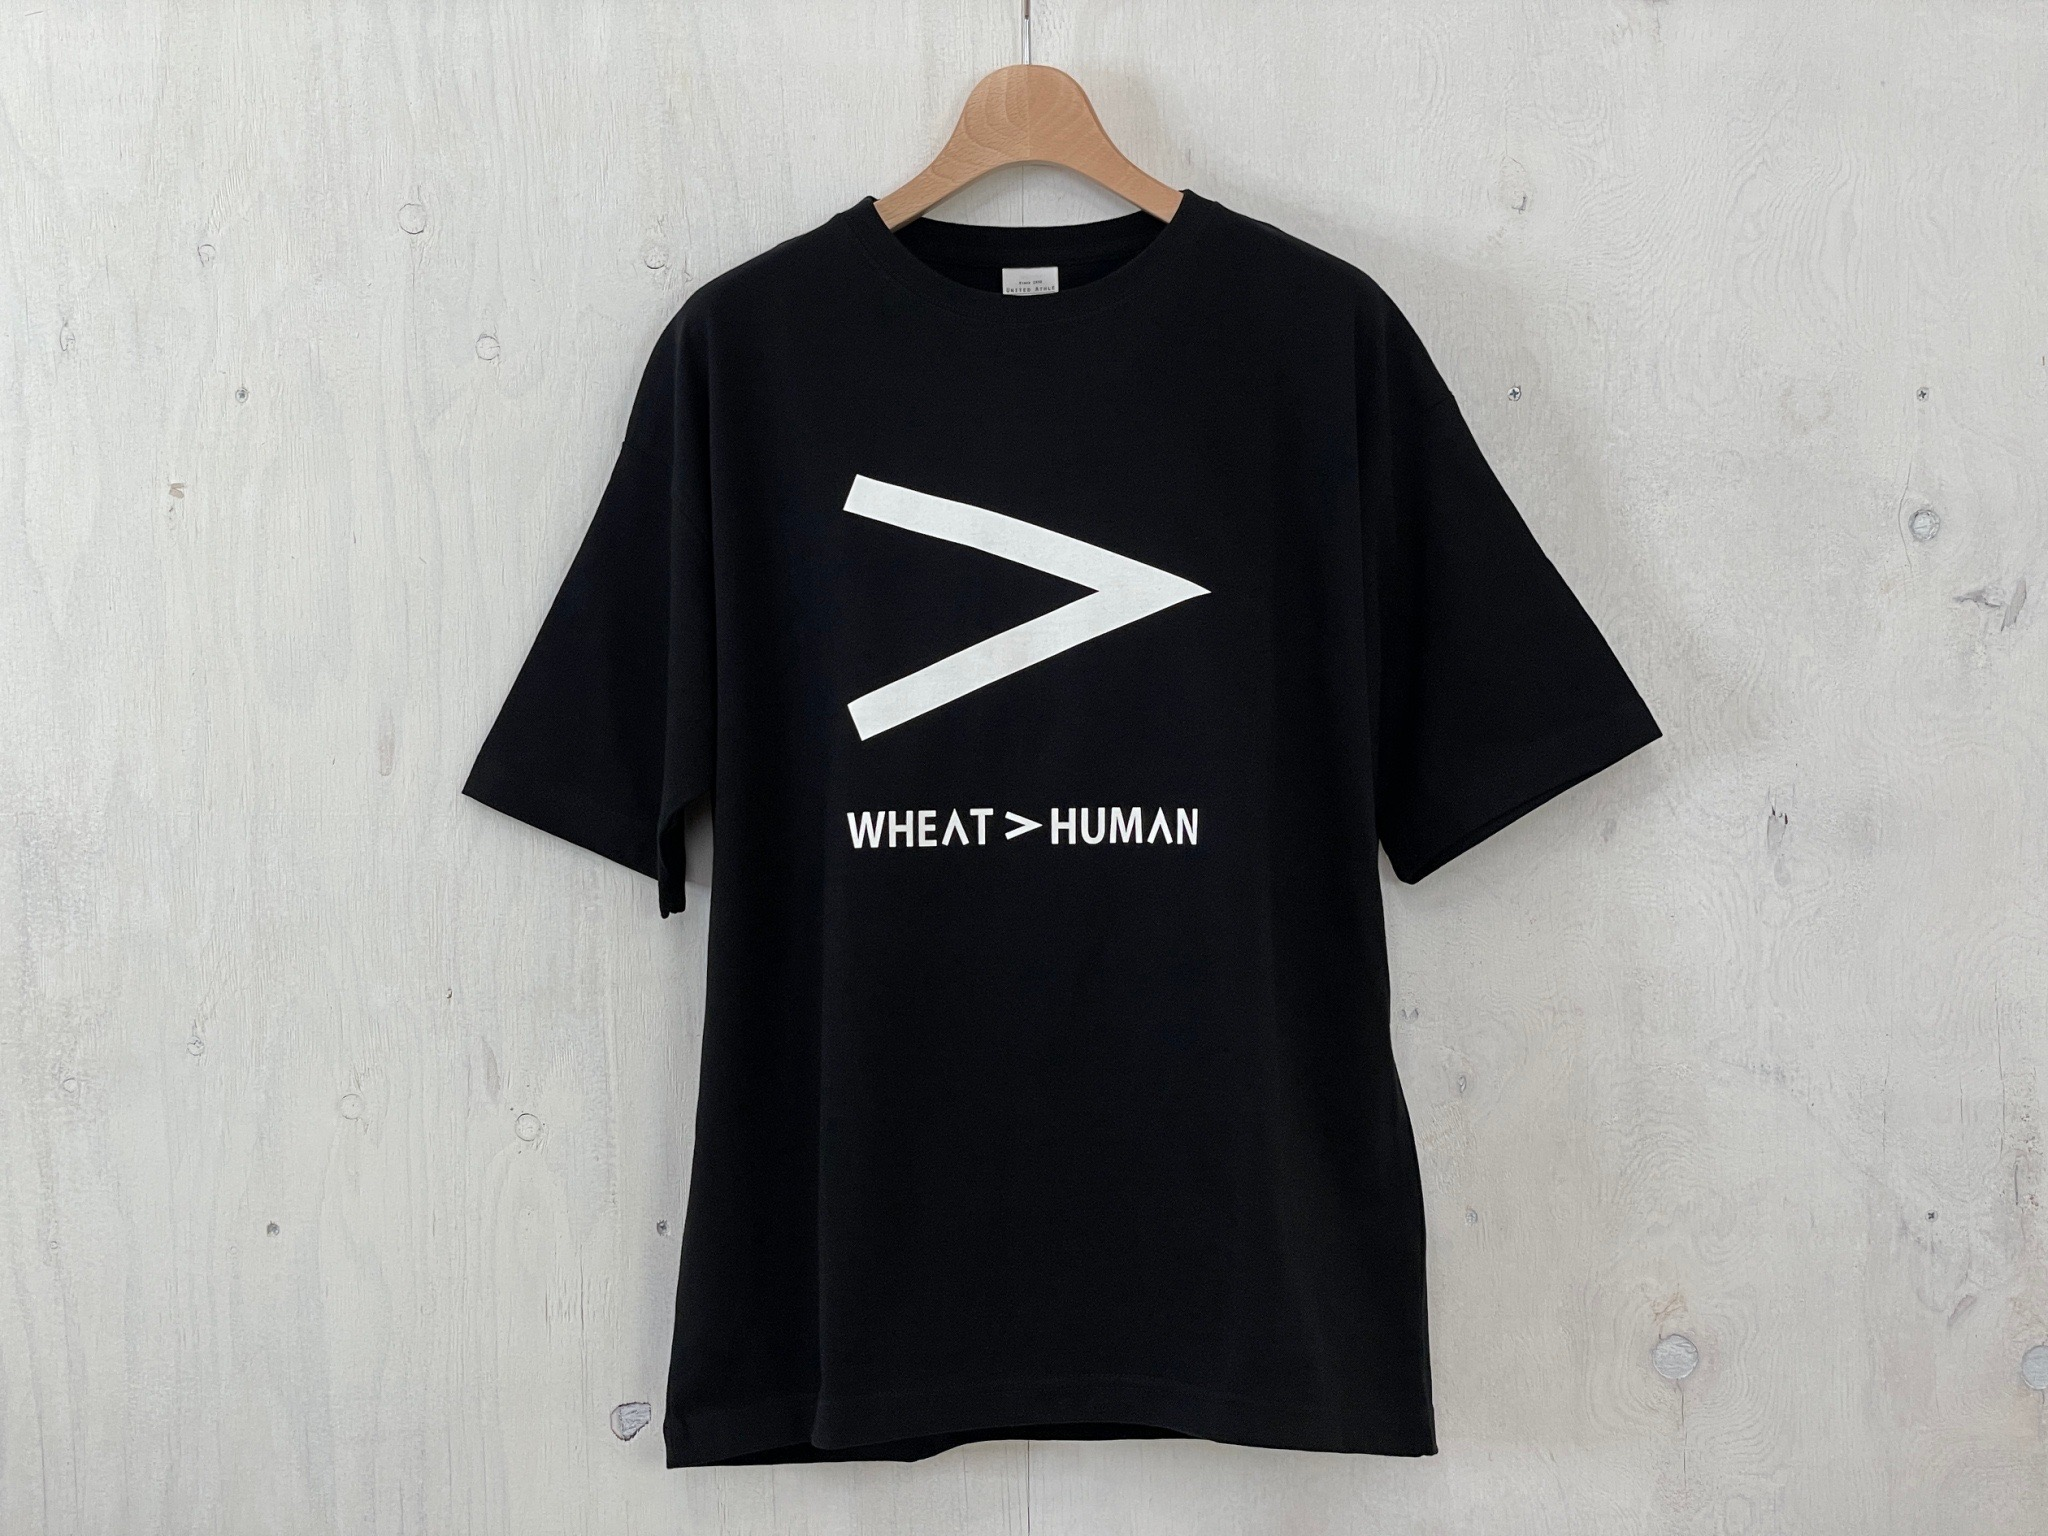 http://小麦の奴隷x%20ARTS%20&%20WORKSコラボTシャツ